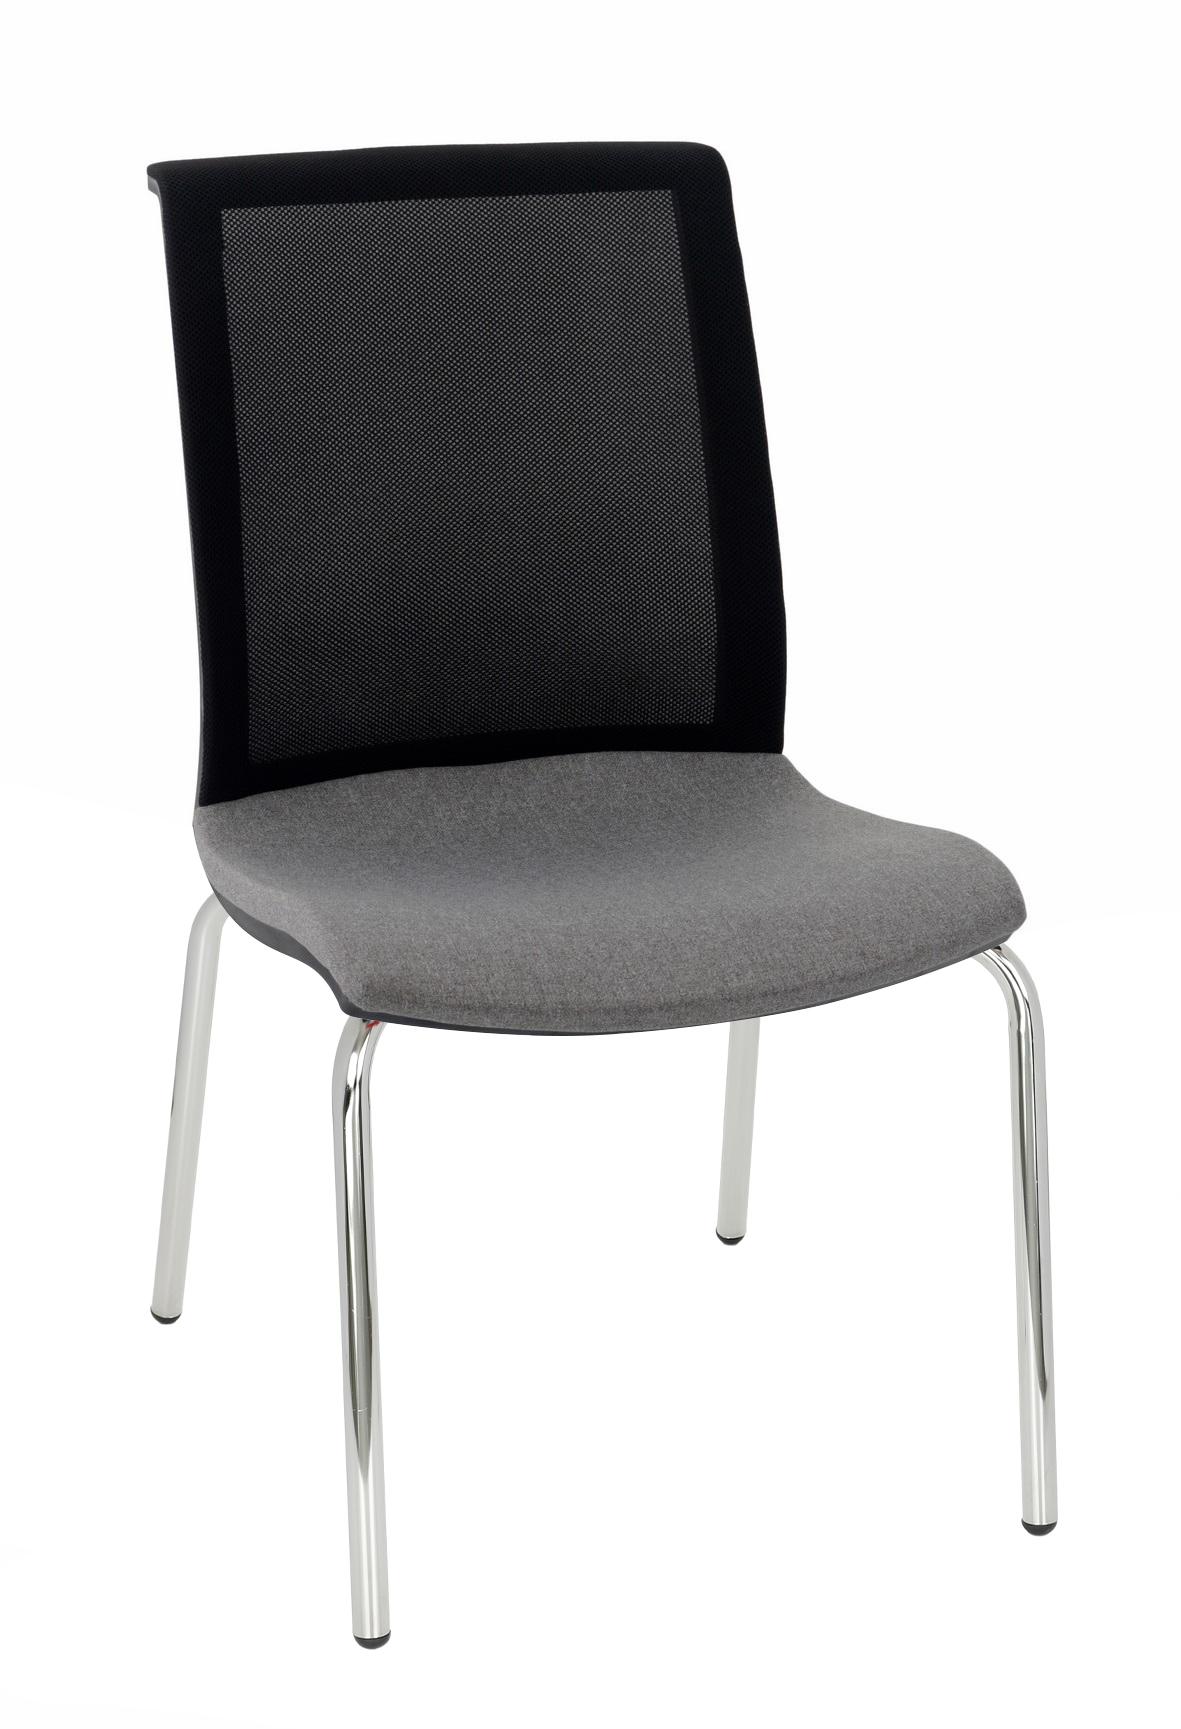 Krzesło Level 4L BS Medley MD05